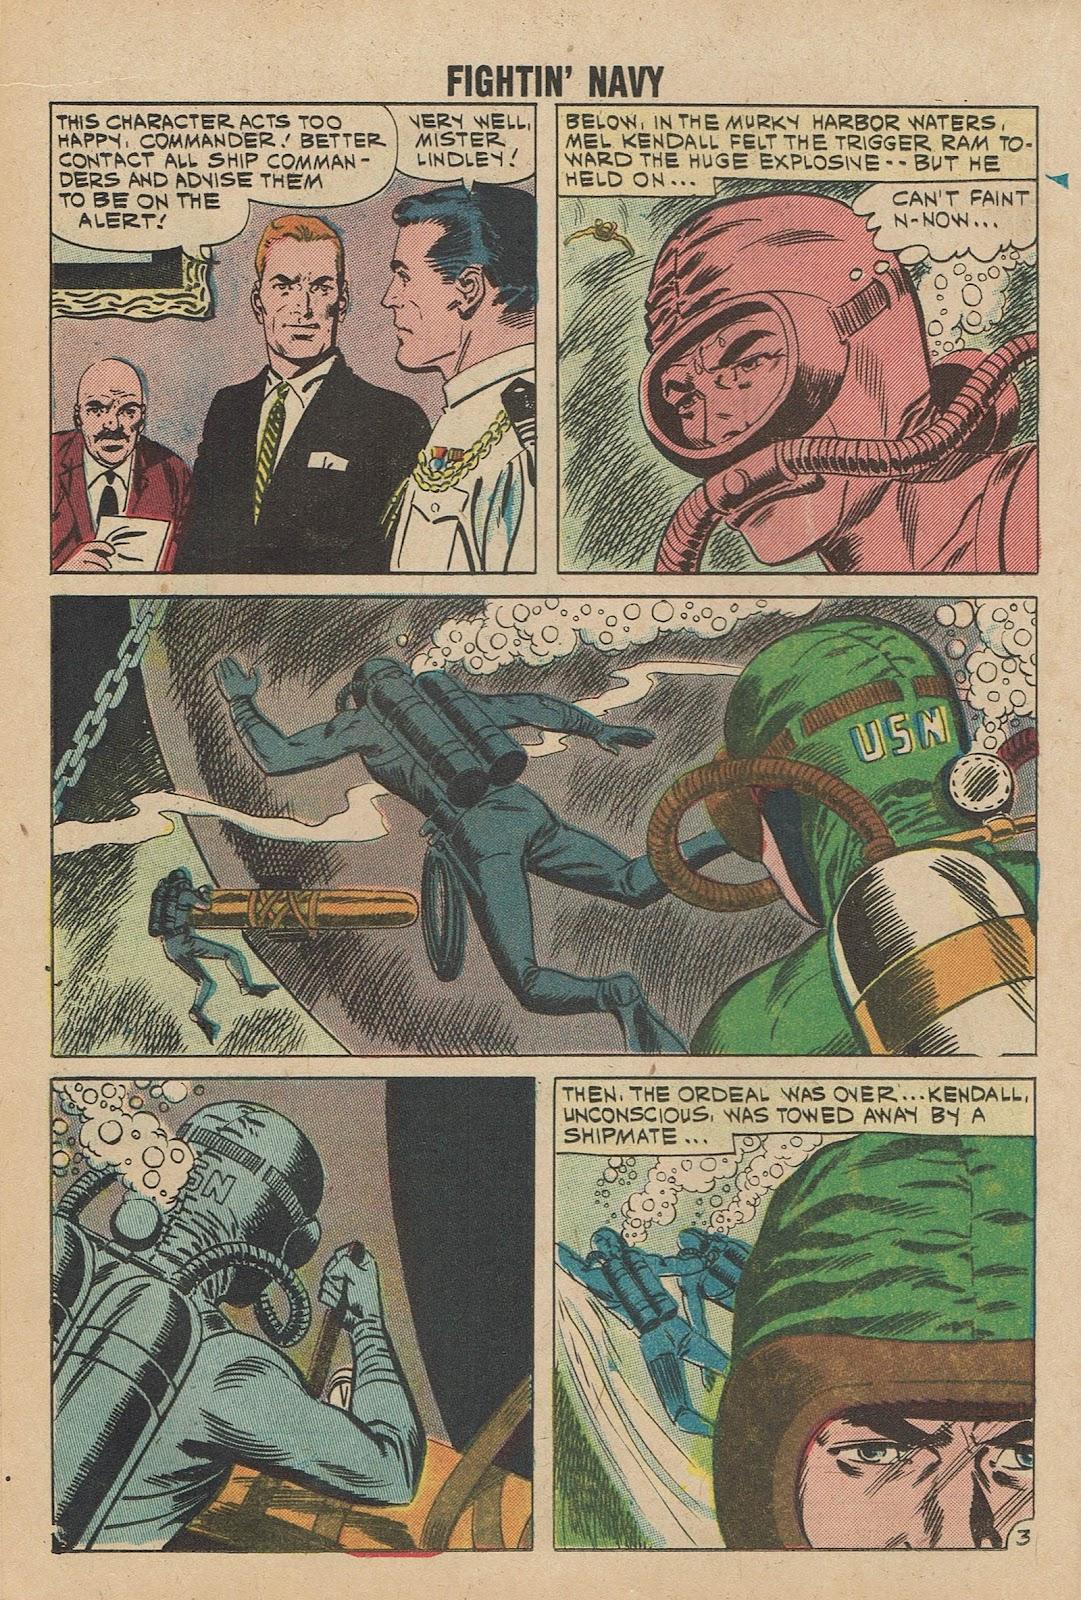 Read online Fightin' Navy comic -  Issue #98 - 16